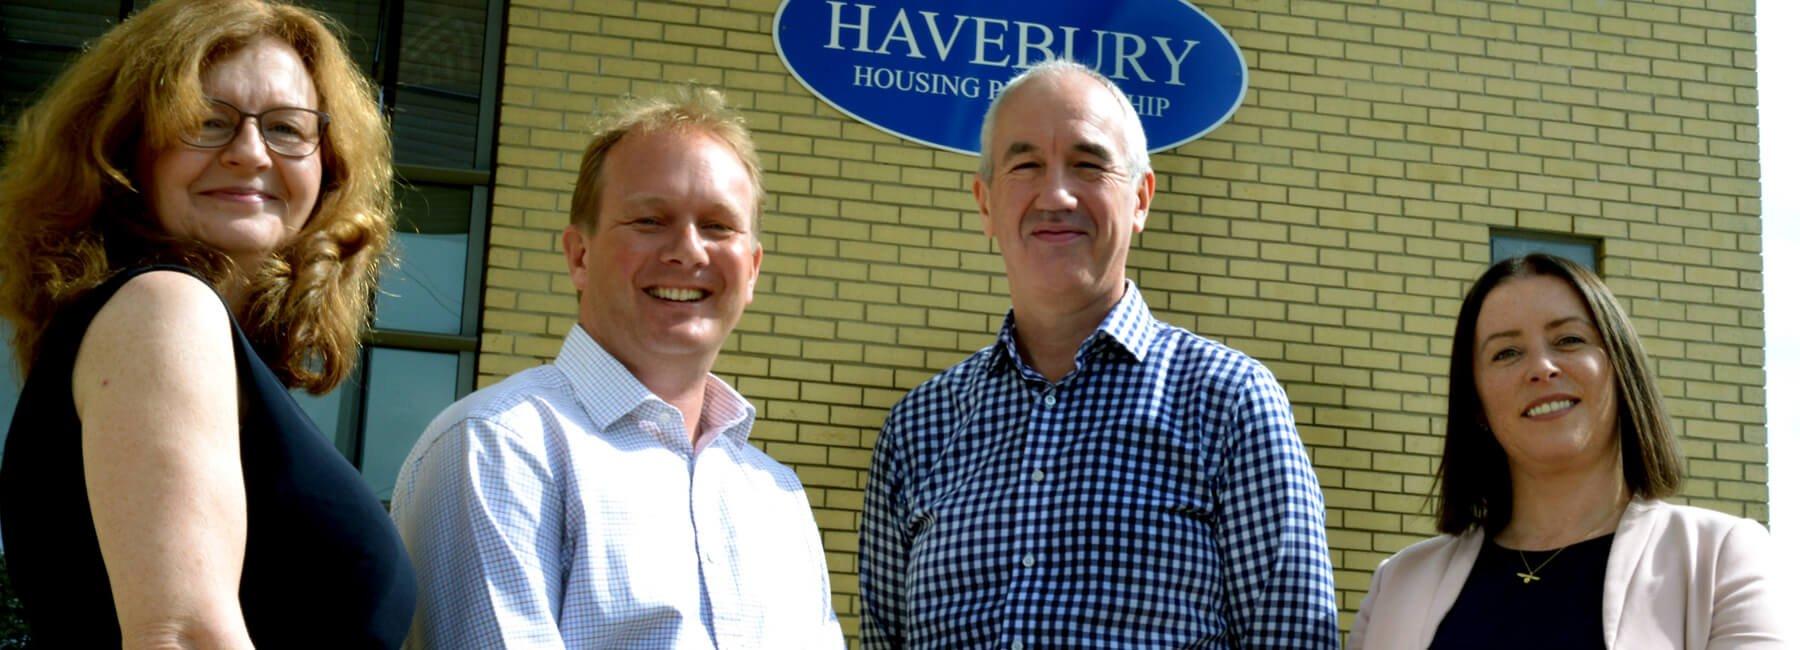 Havebury Housing Partnership's Executive Team